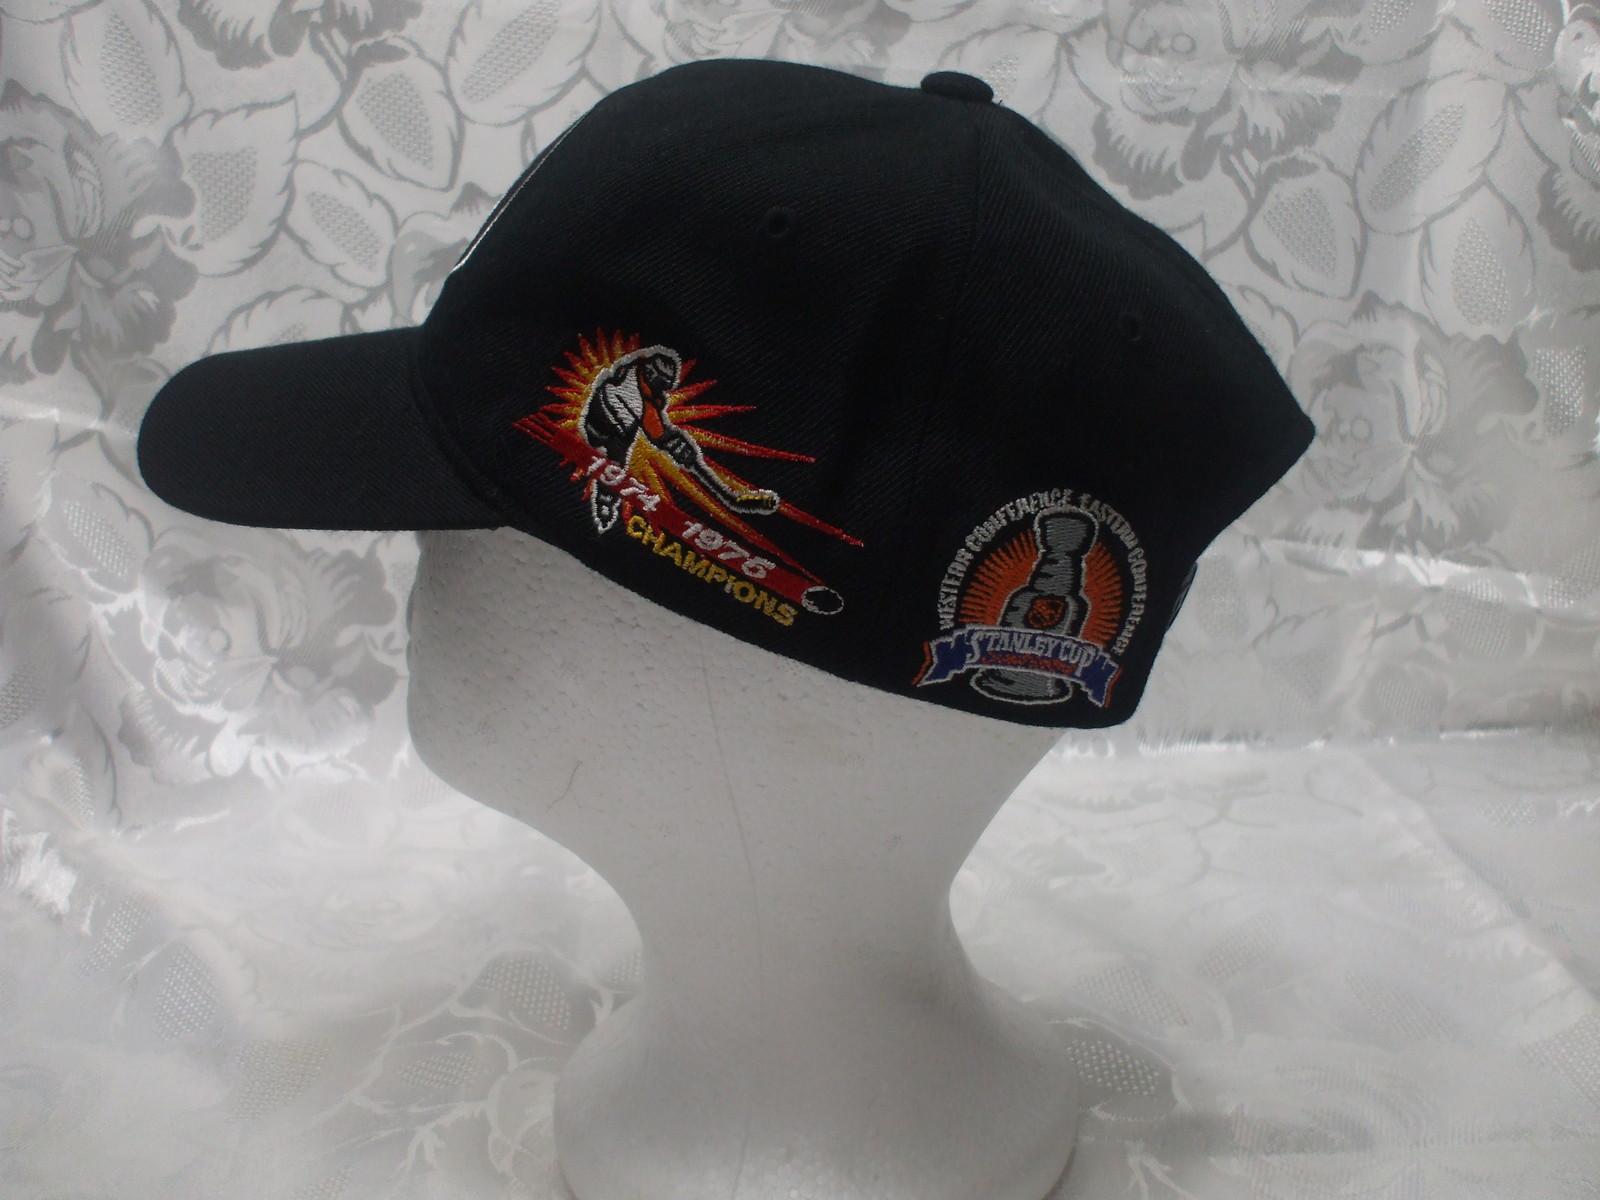 Philadelphia Flyers Hockey Team Baseball Cap 1974-1975 Champs Collectors c08753b41683